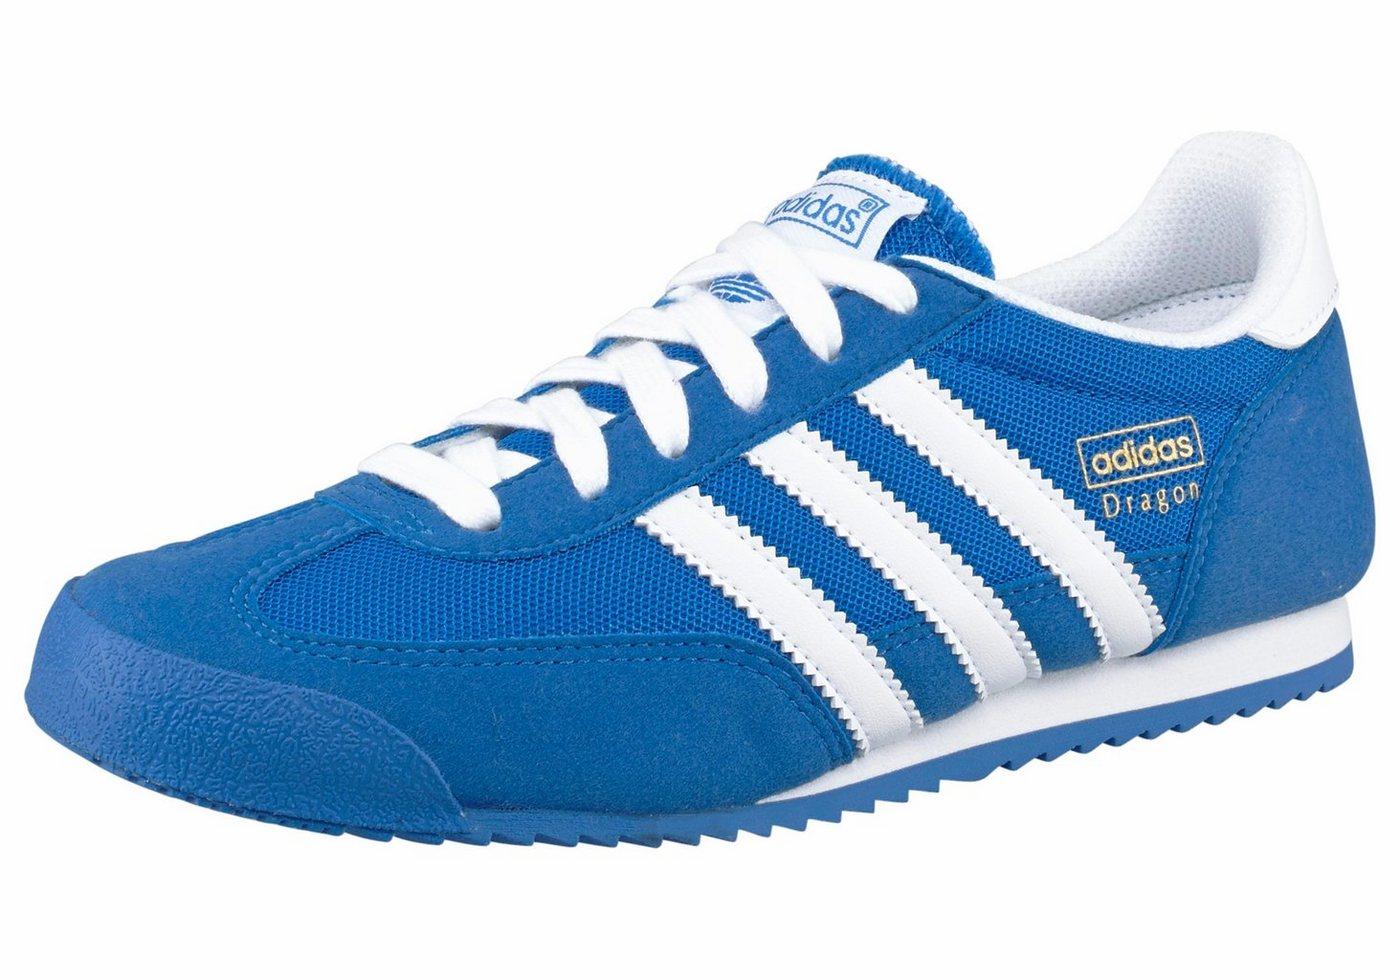 ADIDAS ORIGINALS Sneakers Dragon J blauw/wit